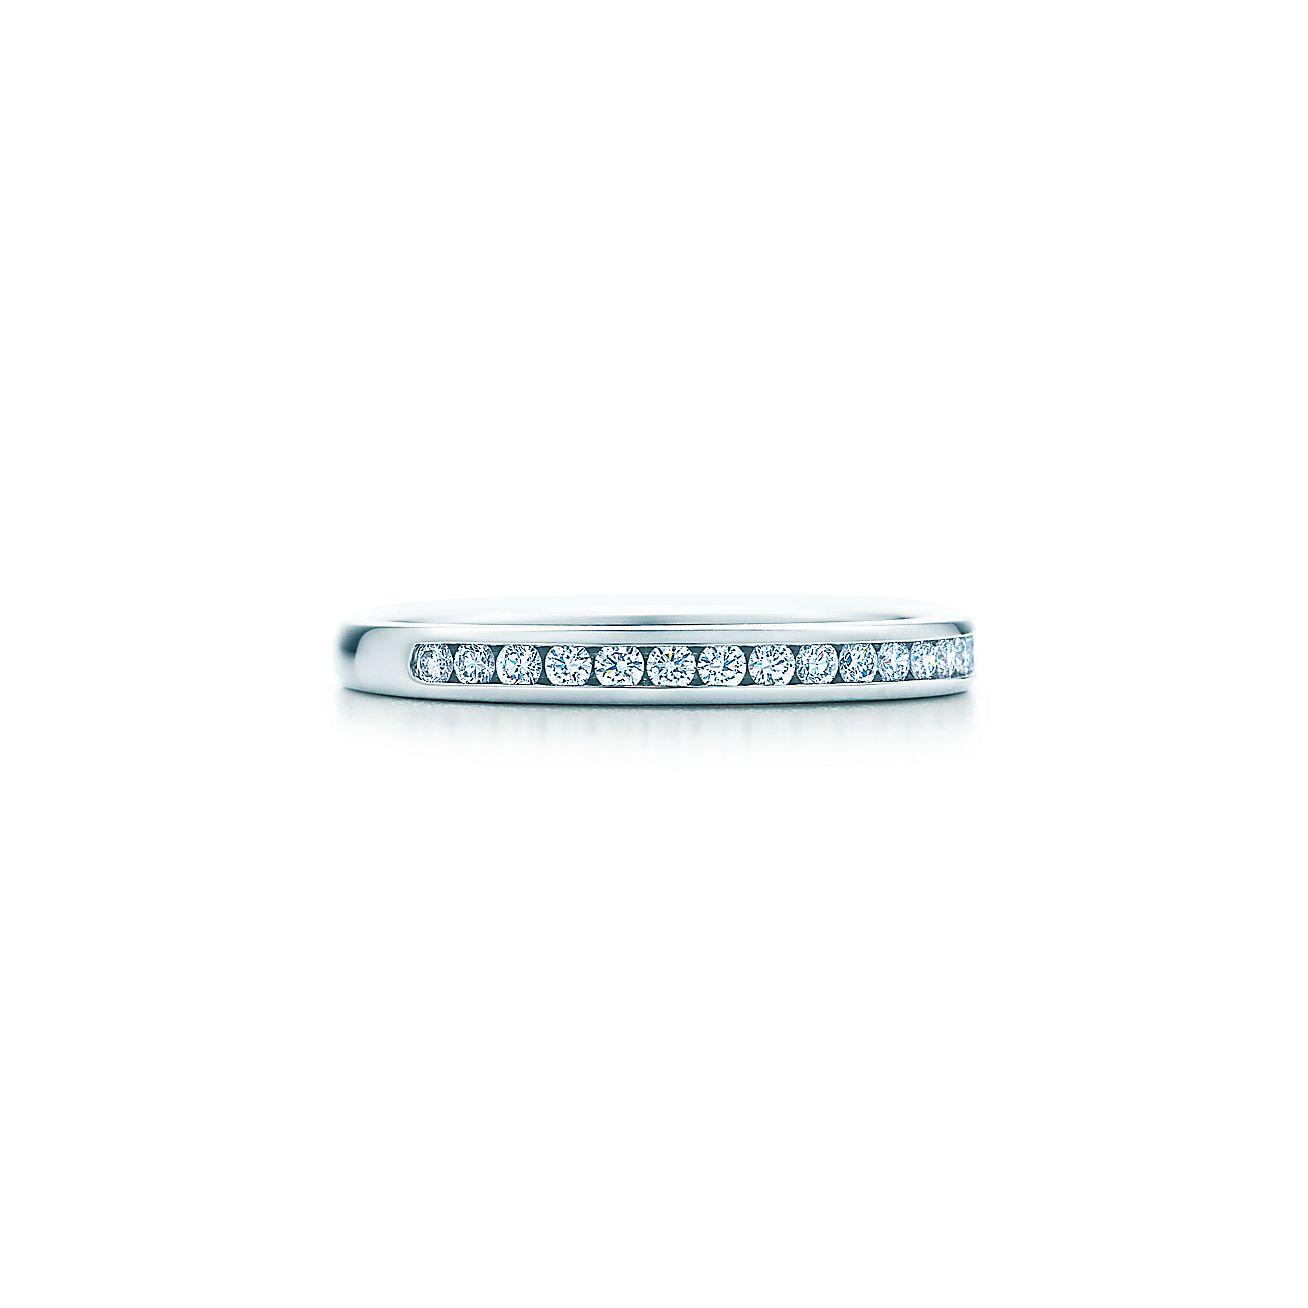 Tiffany diamond wedding band in platinum 2 mm wide tiffany co junglespirit Image collections